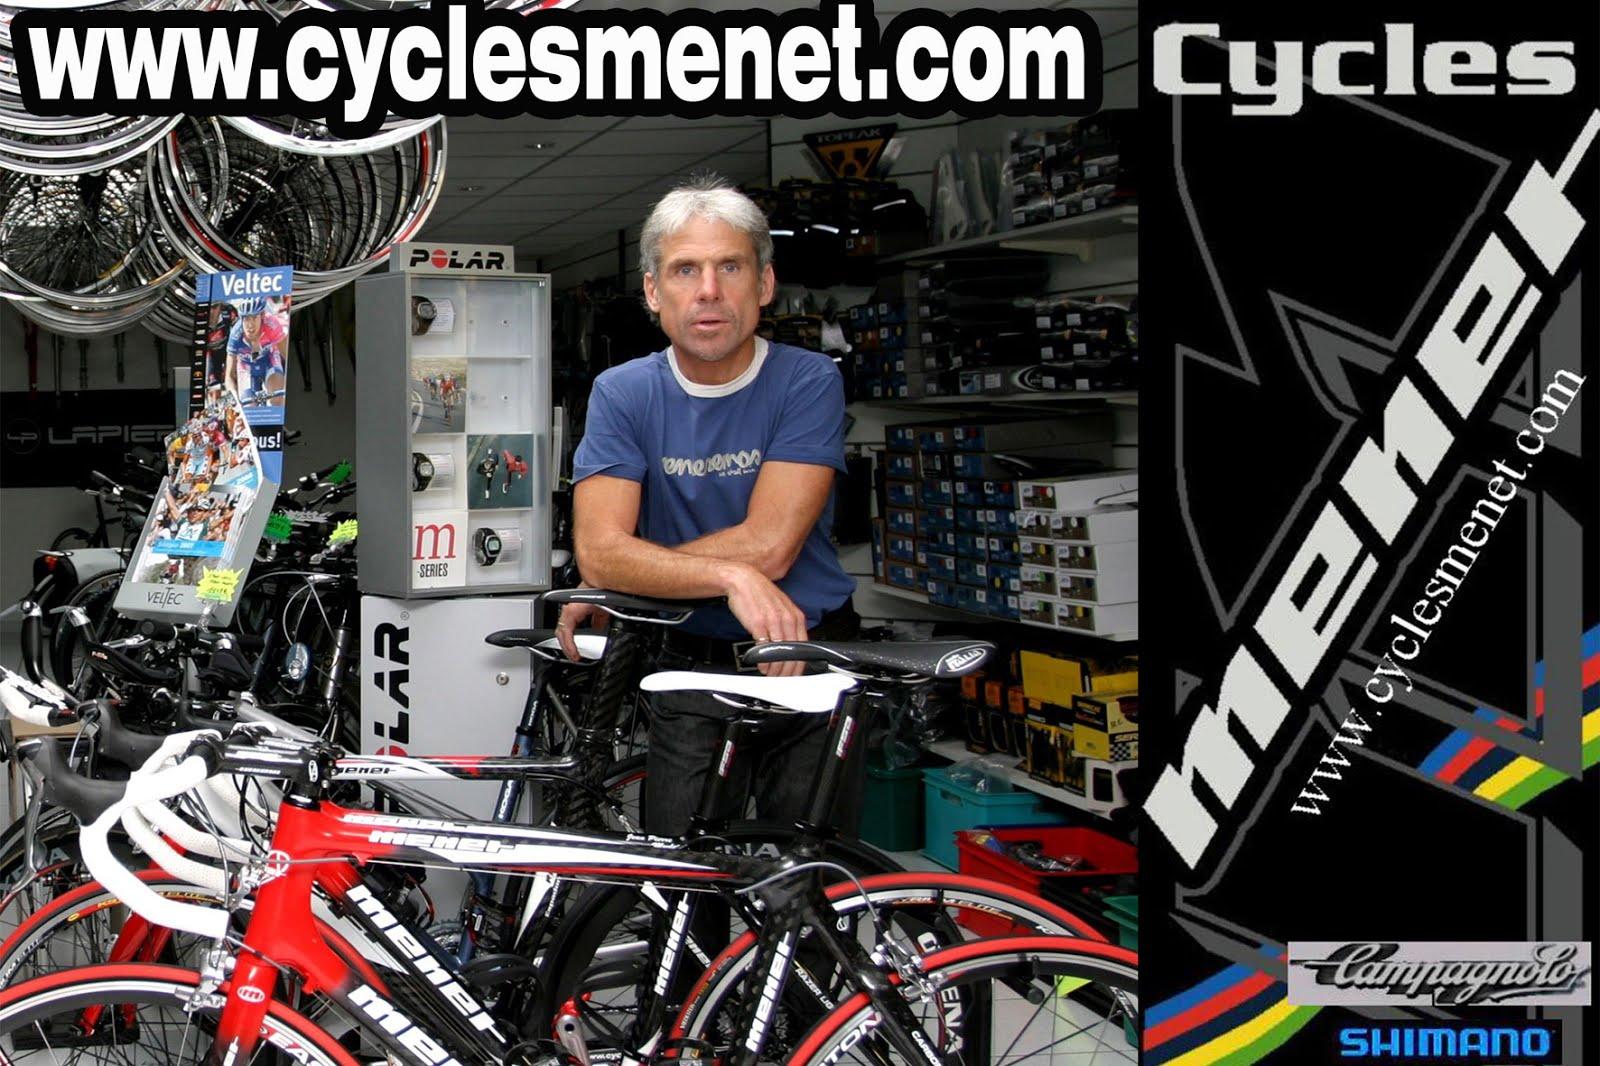 CYCLES MENET